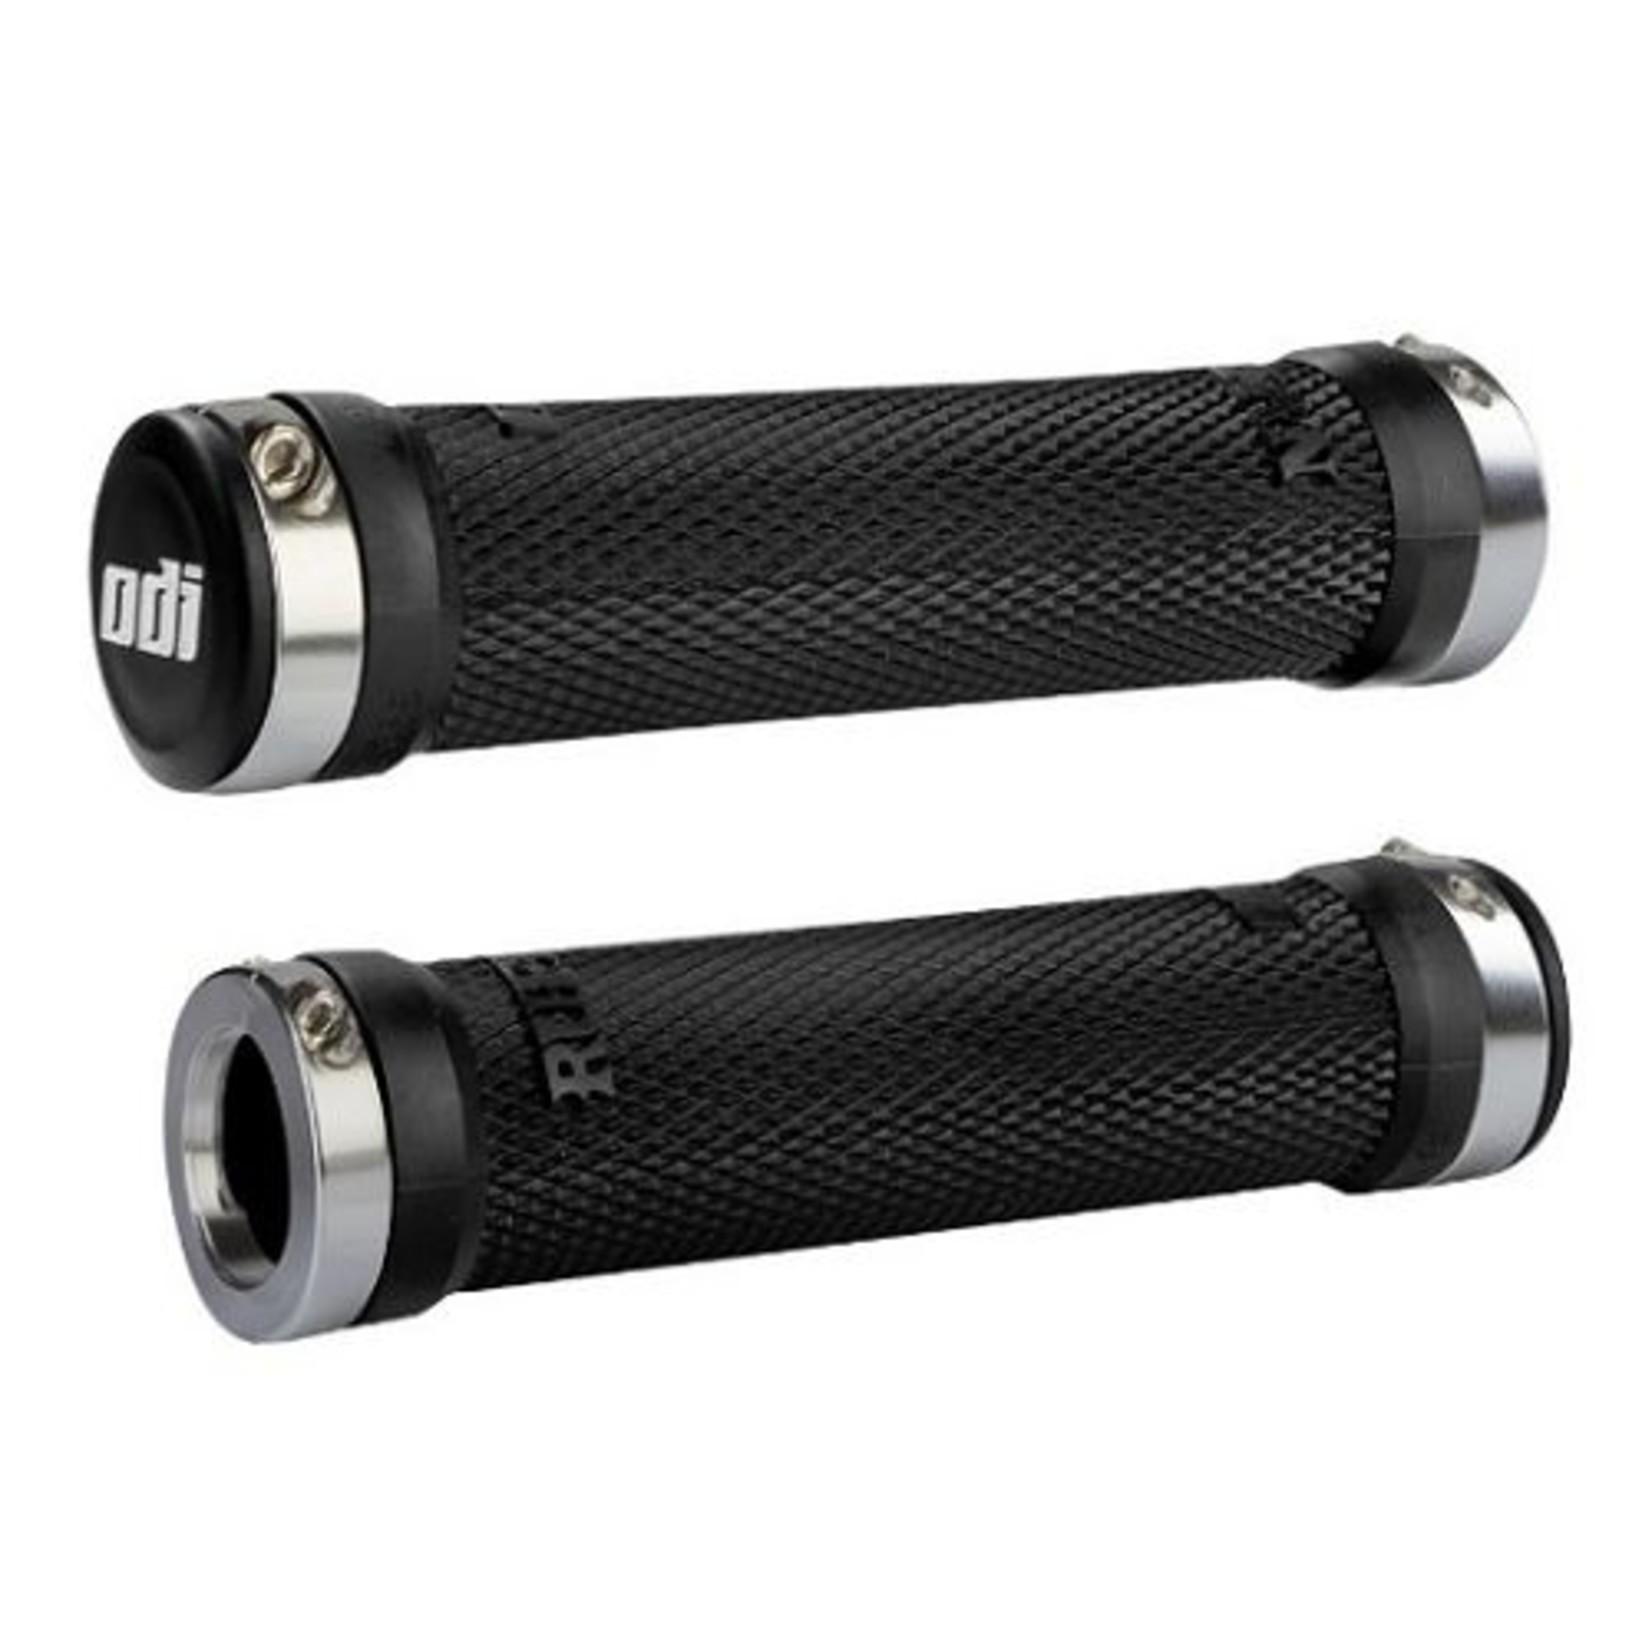 ODI Odi Ruffian Lock-On Grips Black 130mm